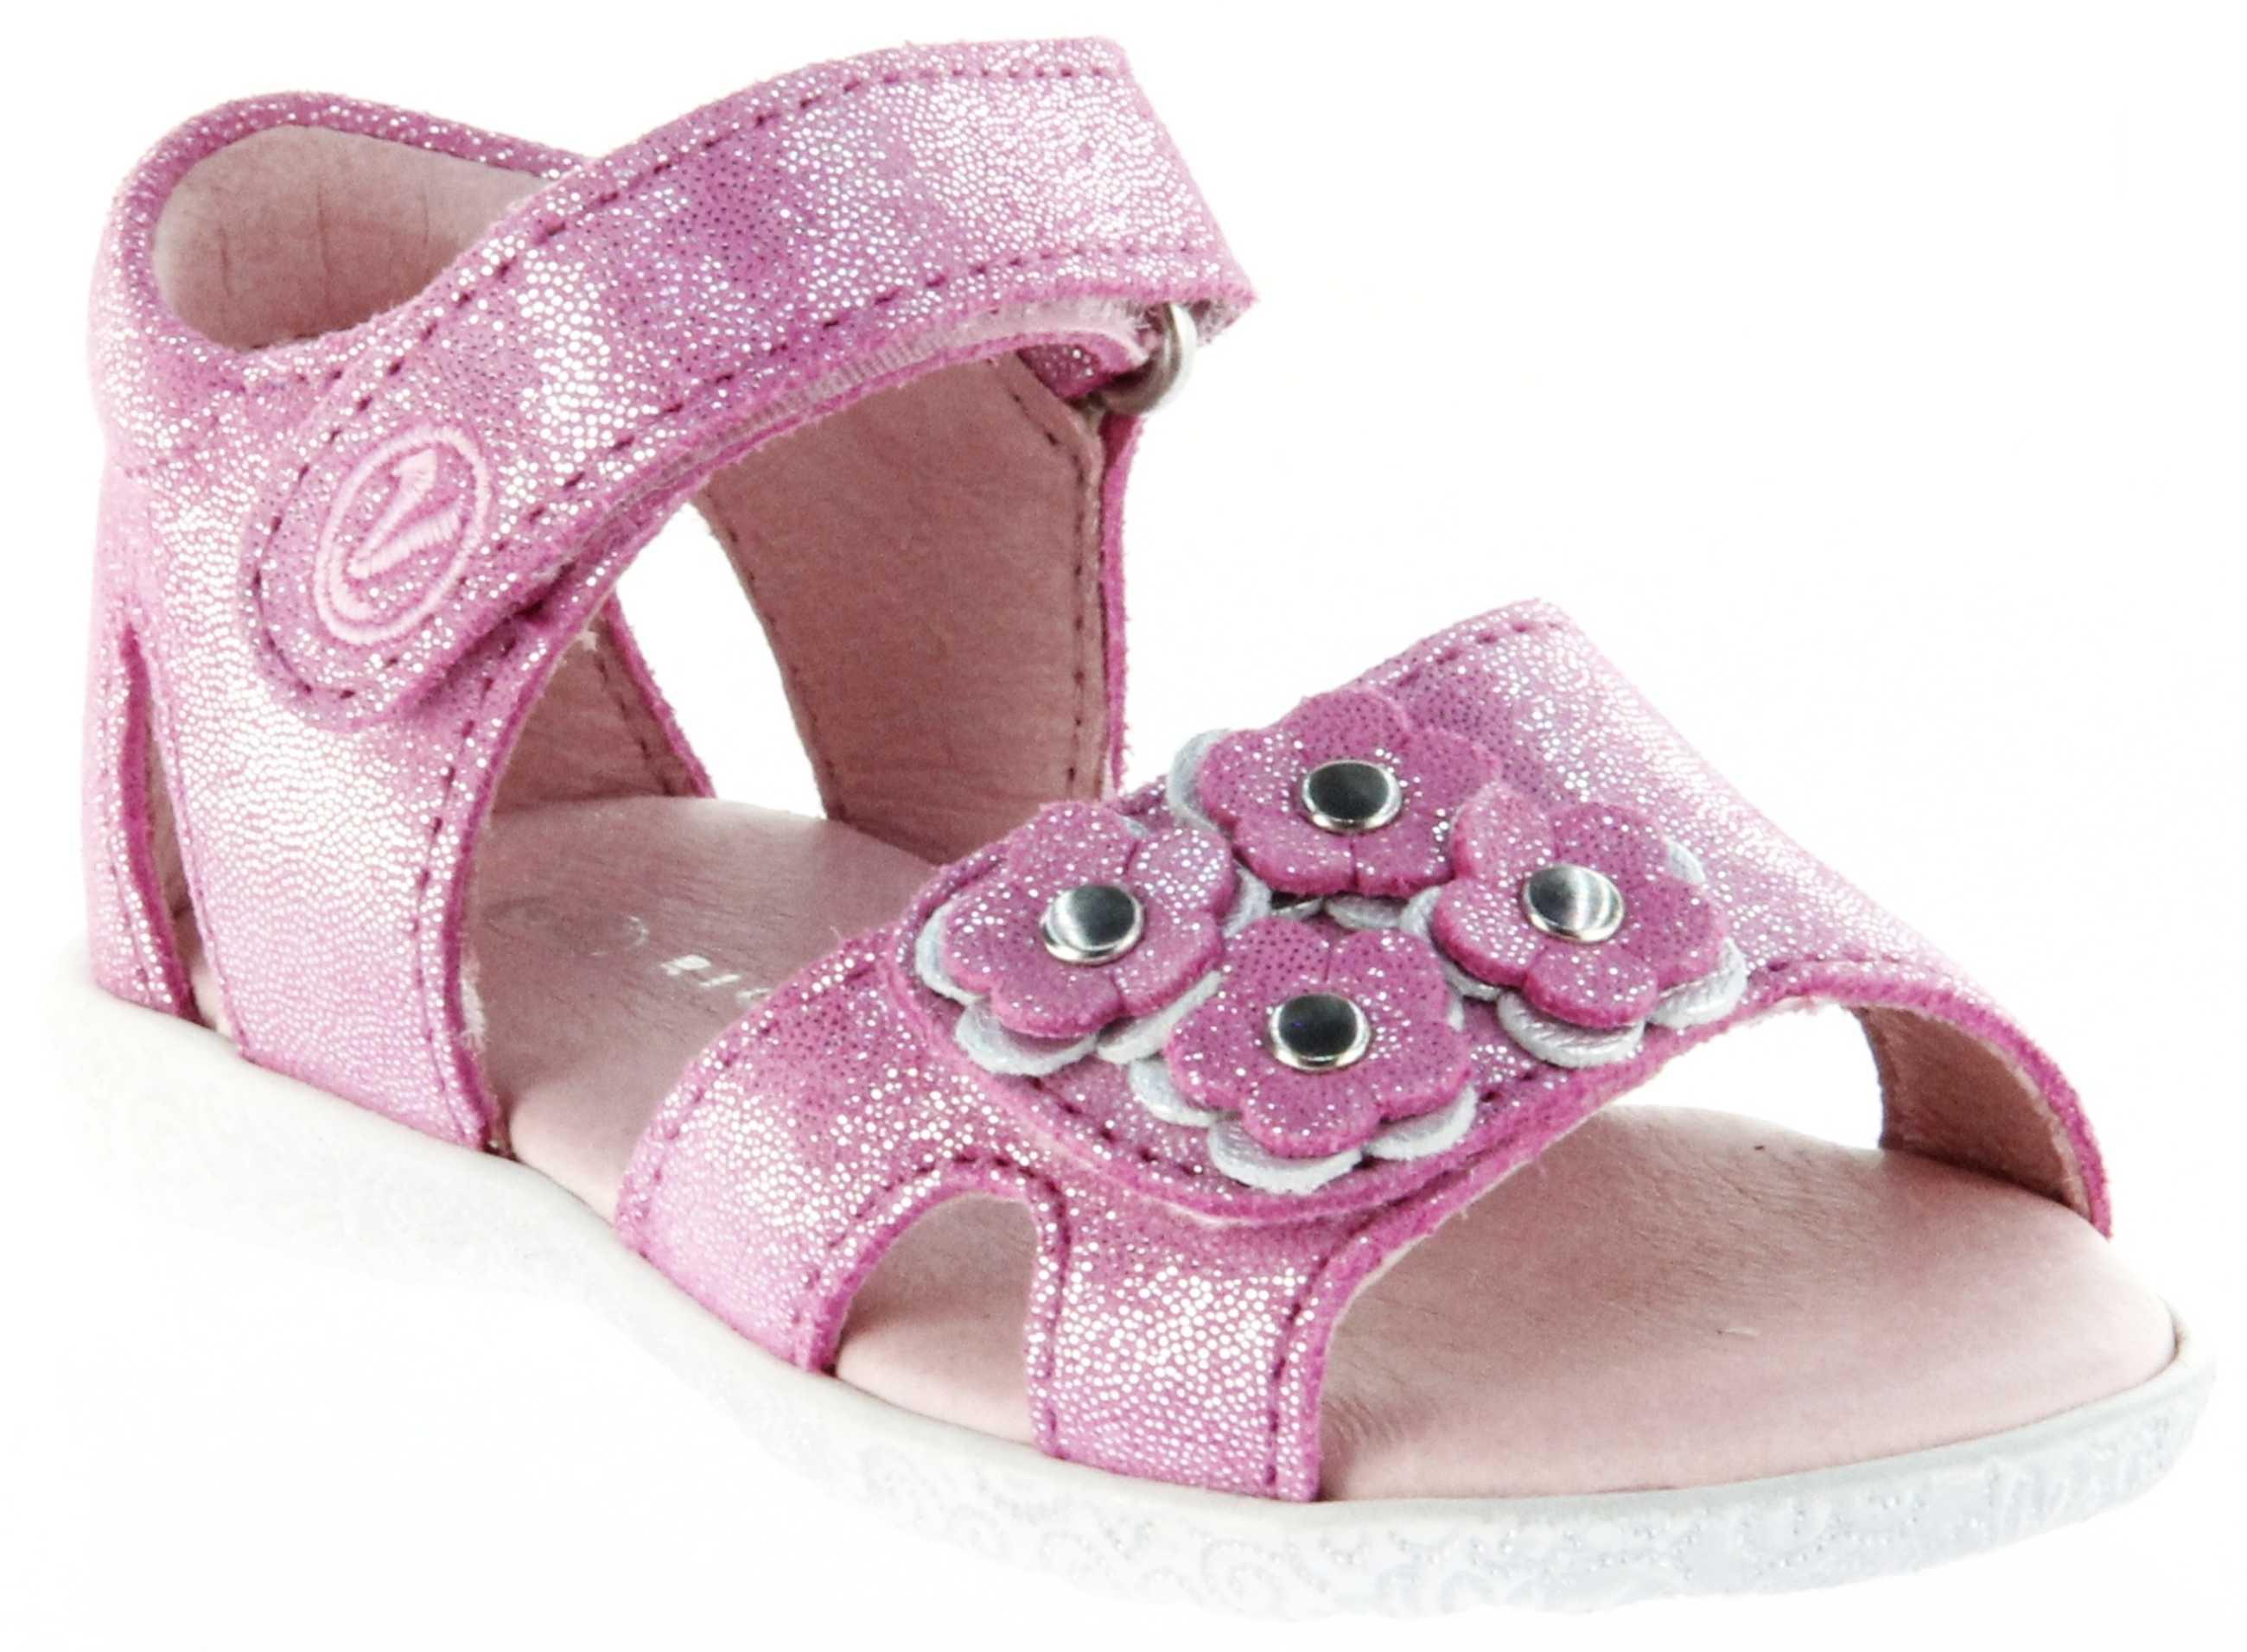 buy popular 09282 efeaf Richter Kinder Lauflerner-Sandalen pink Glitzerverlour Mädchen Schuhe  2201-143-3701 Sissi S